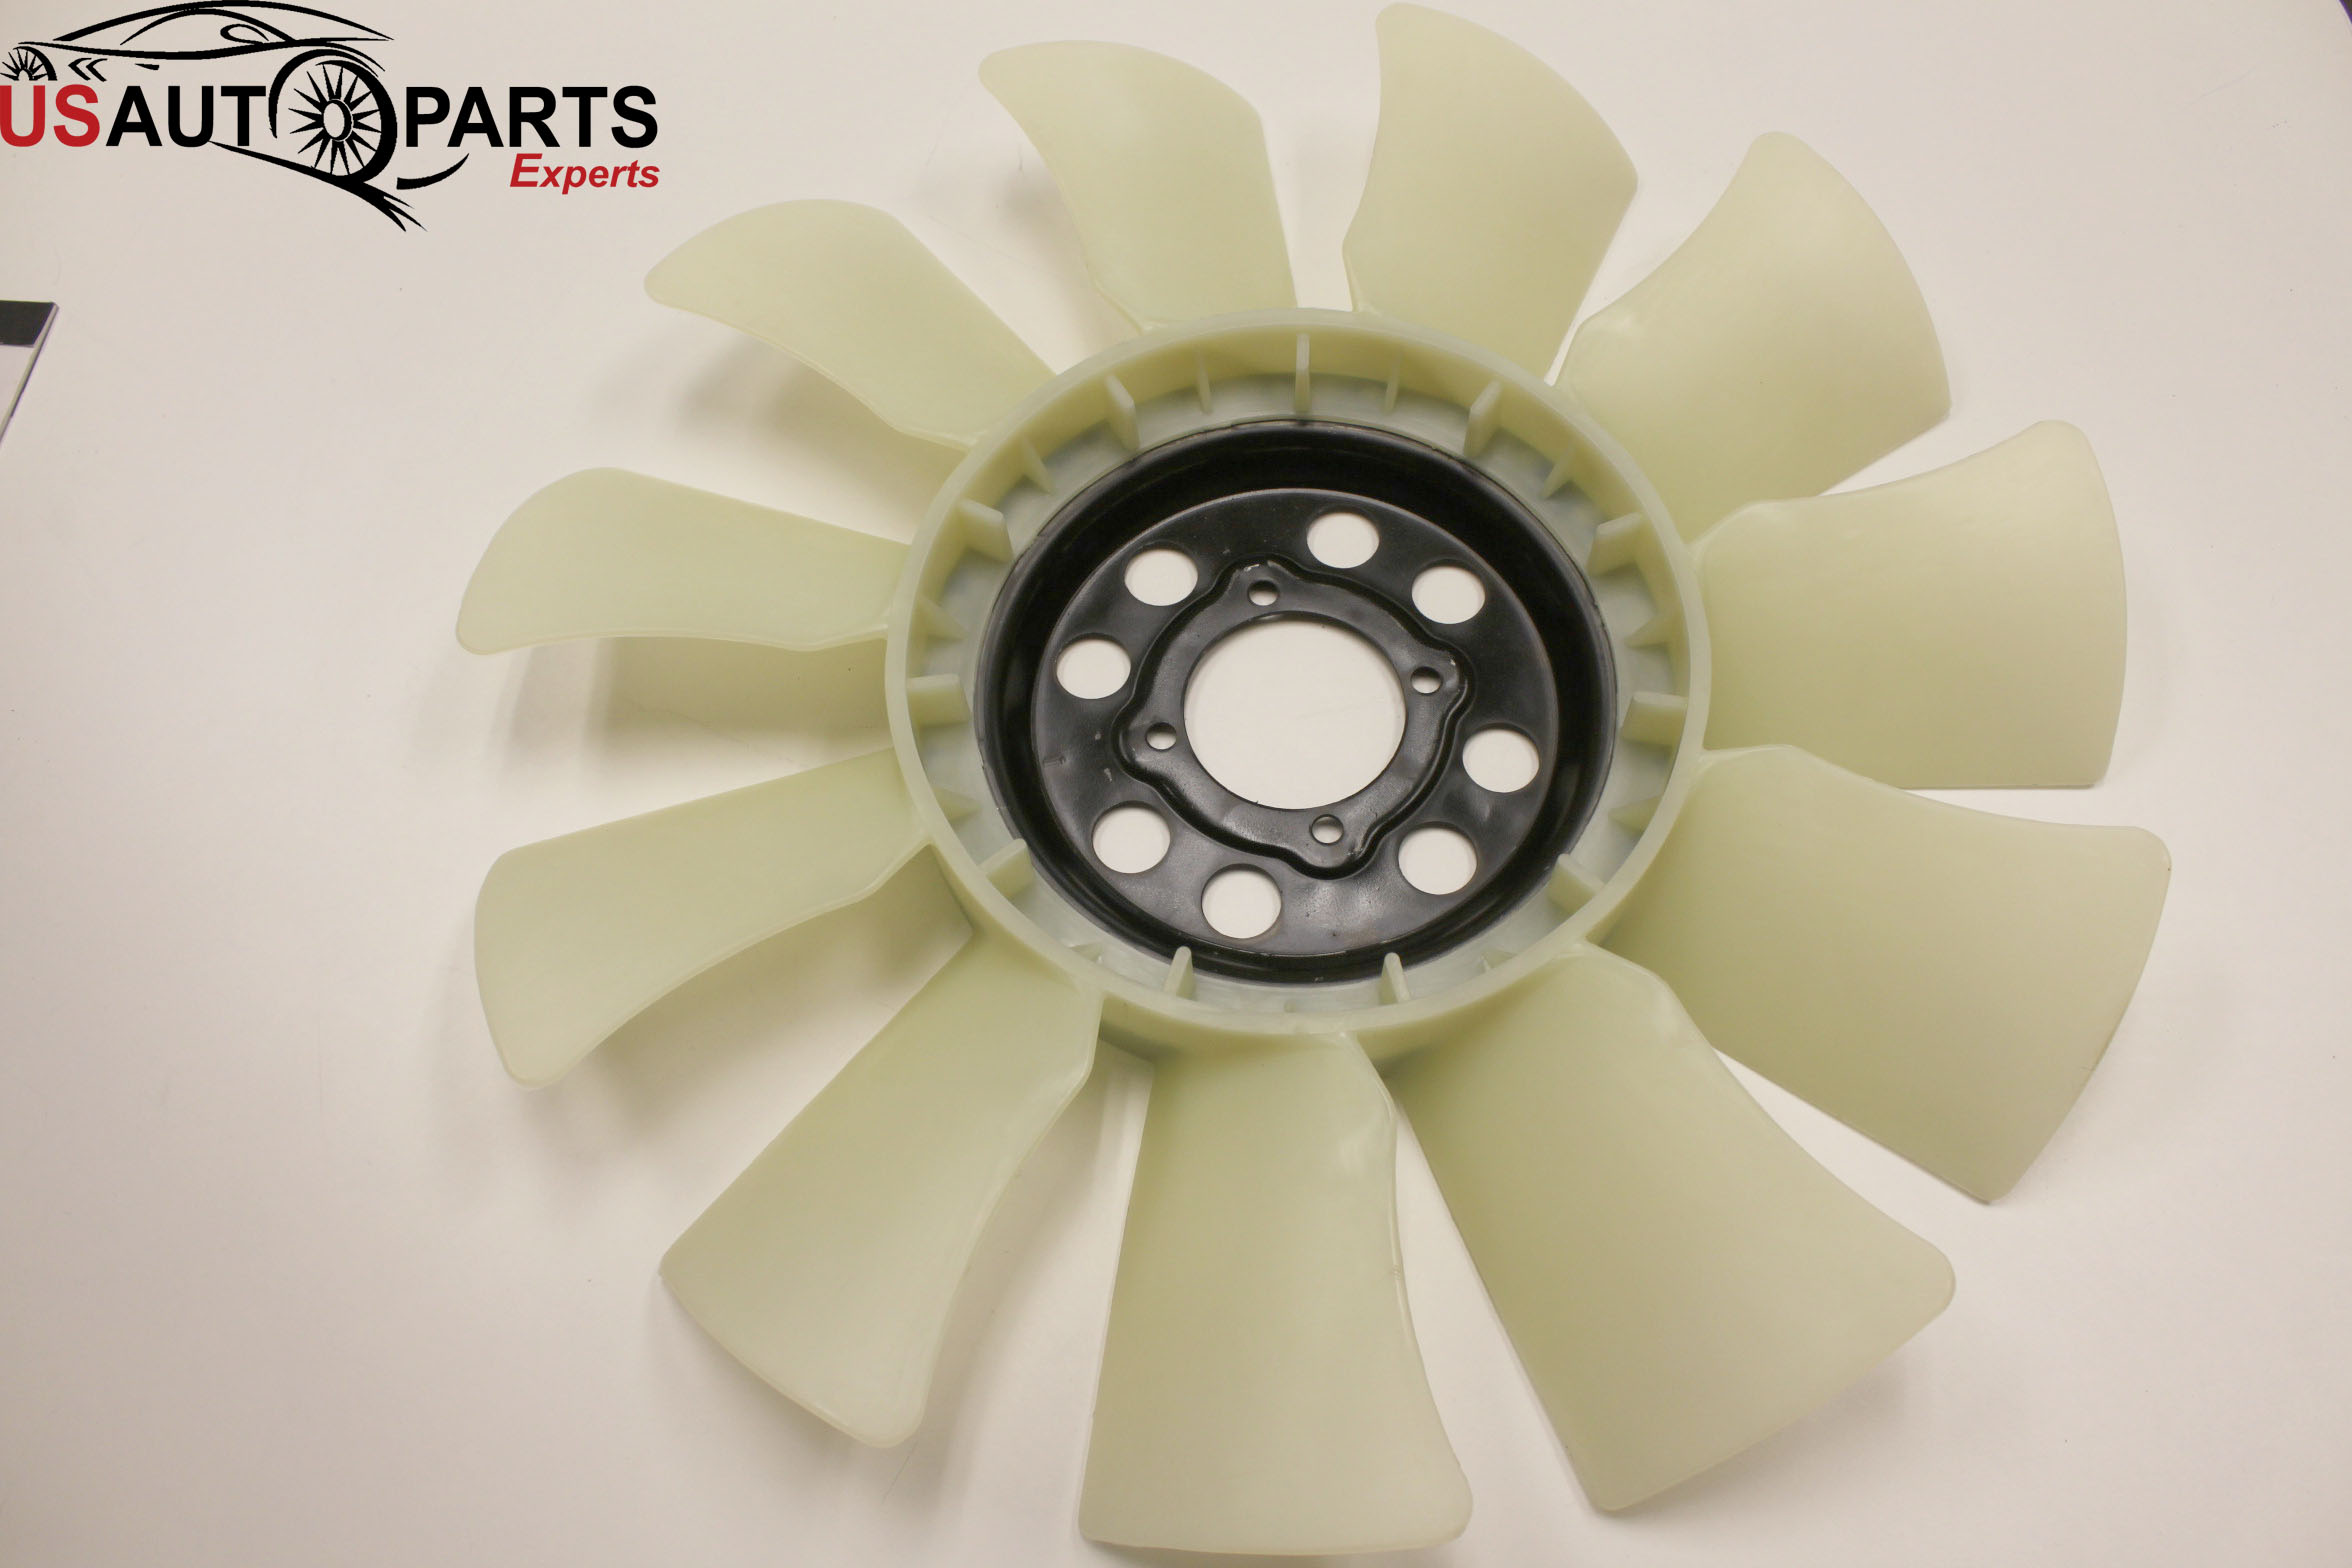 Engine Cooling Fan Blade fits 99-10 Ford F-350 Super Duty 6.8L-V10